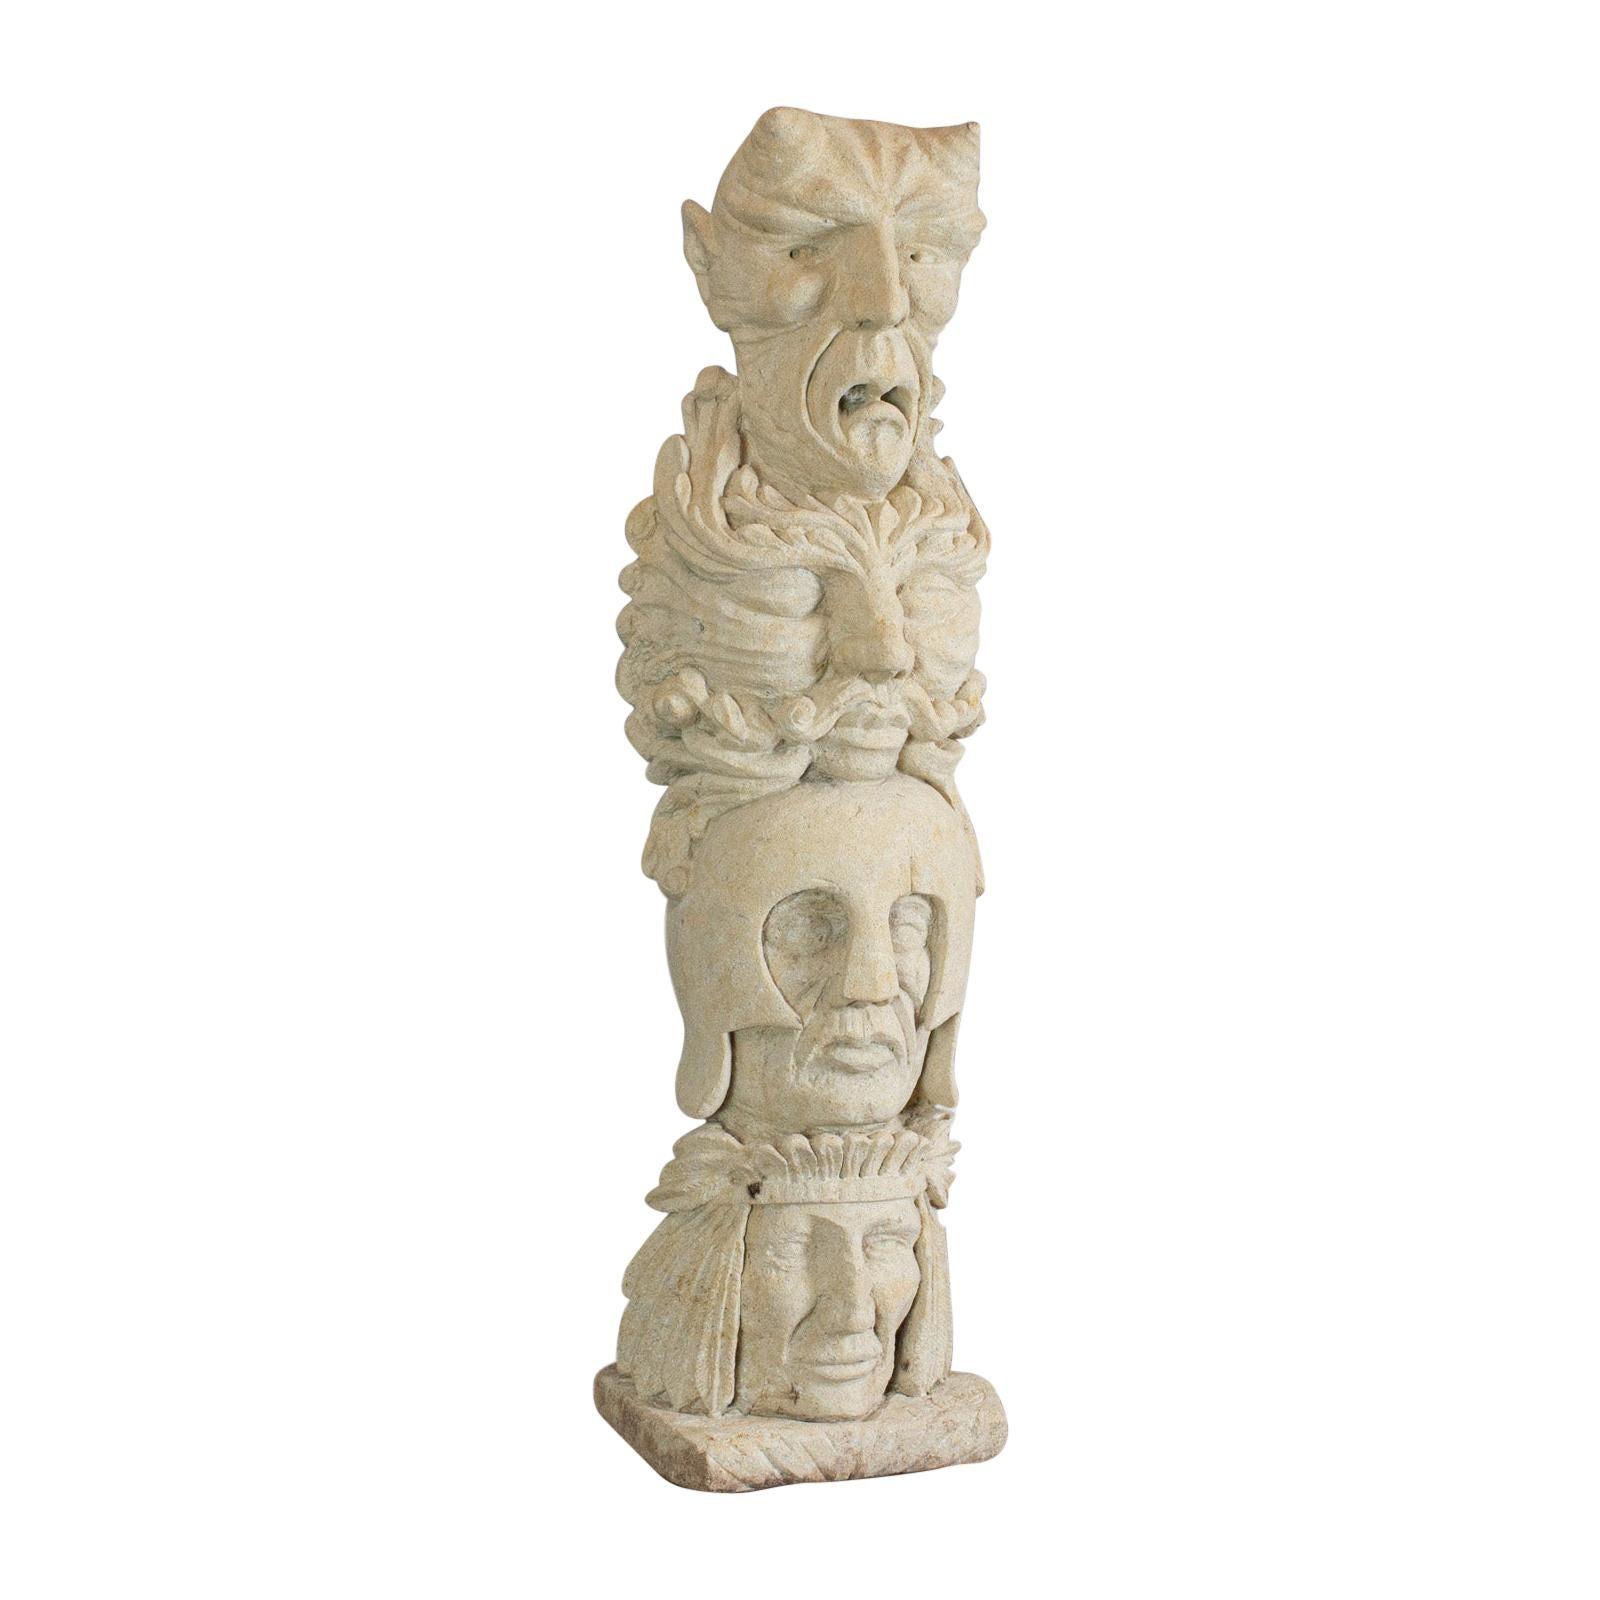 Courage, Artwork, Dominic Hurley, English, Sculpture, Bath Stone, Totem Pole